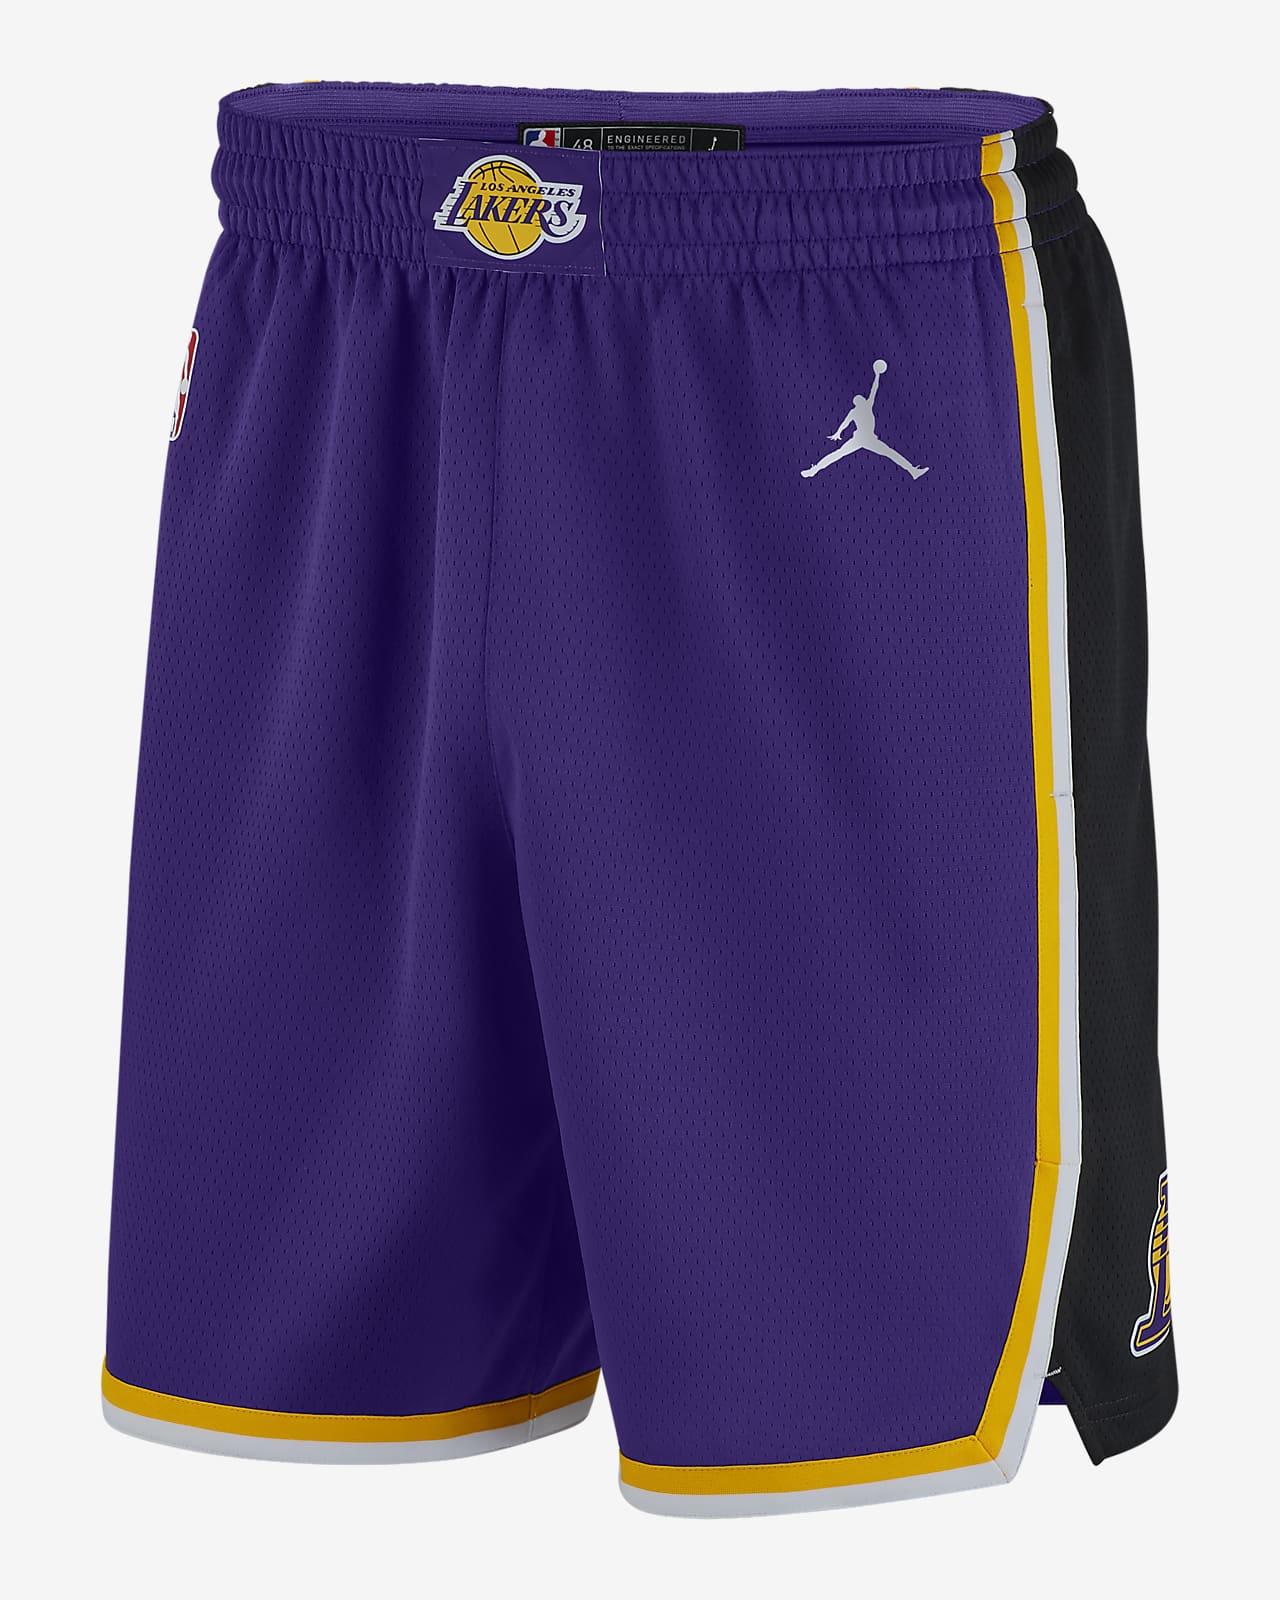 Calções NBA Jordan Swingman Lakers Statement Edition 2020 para homem